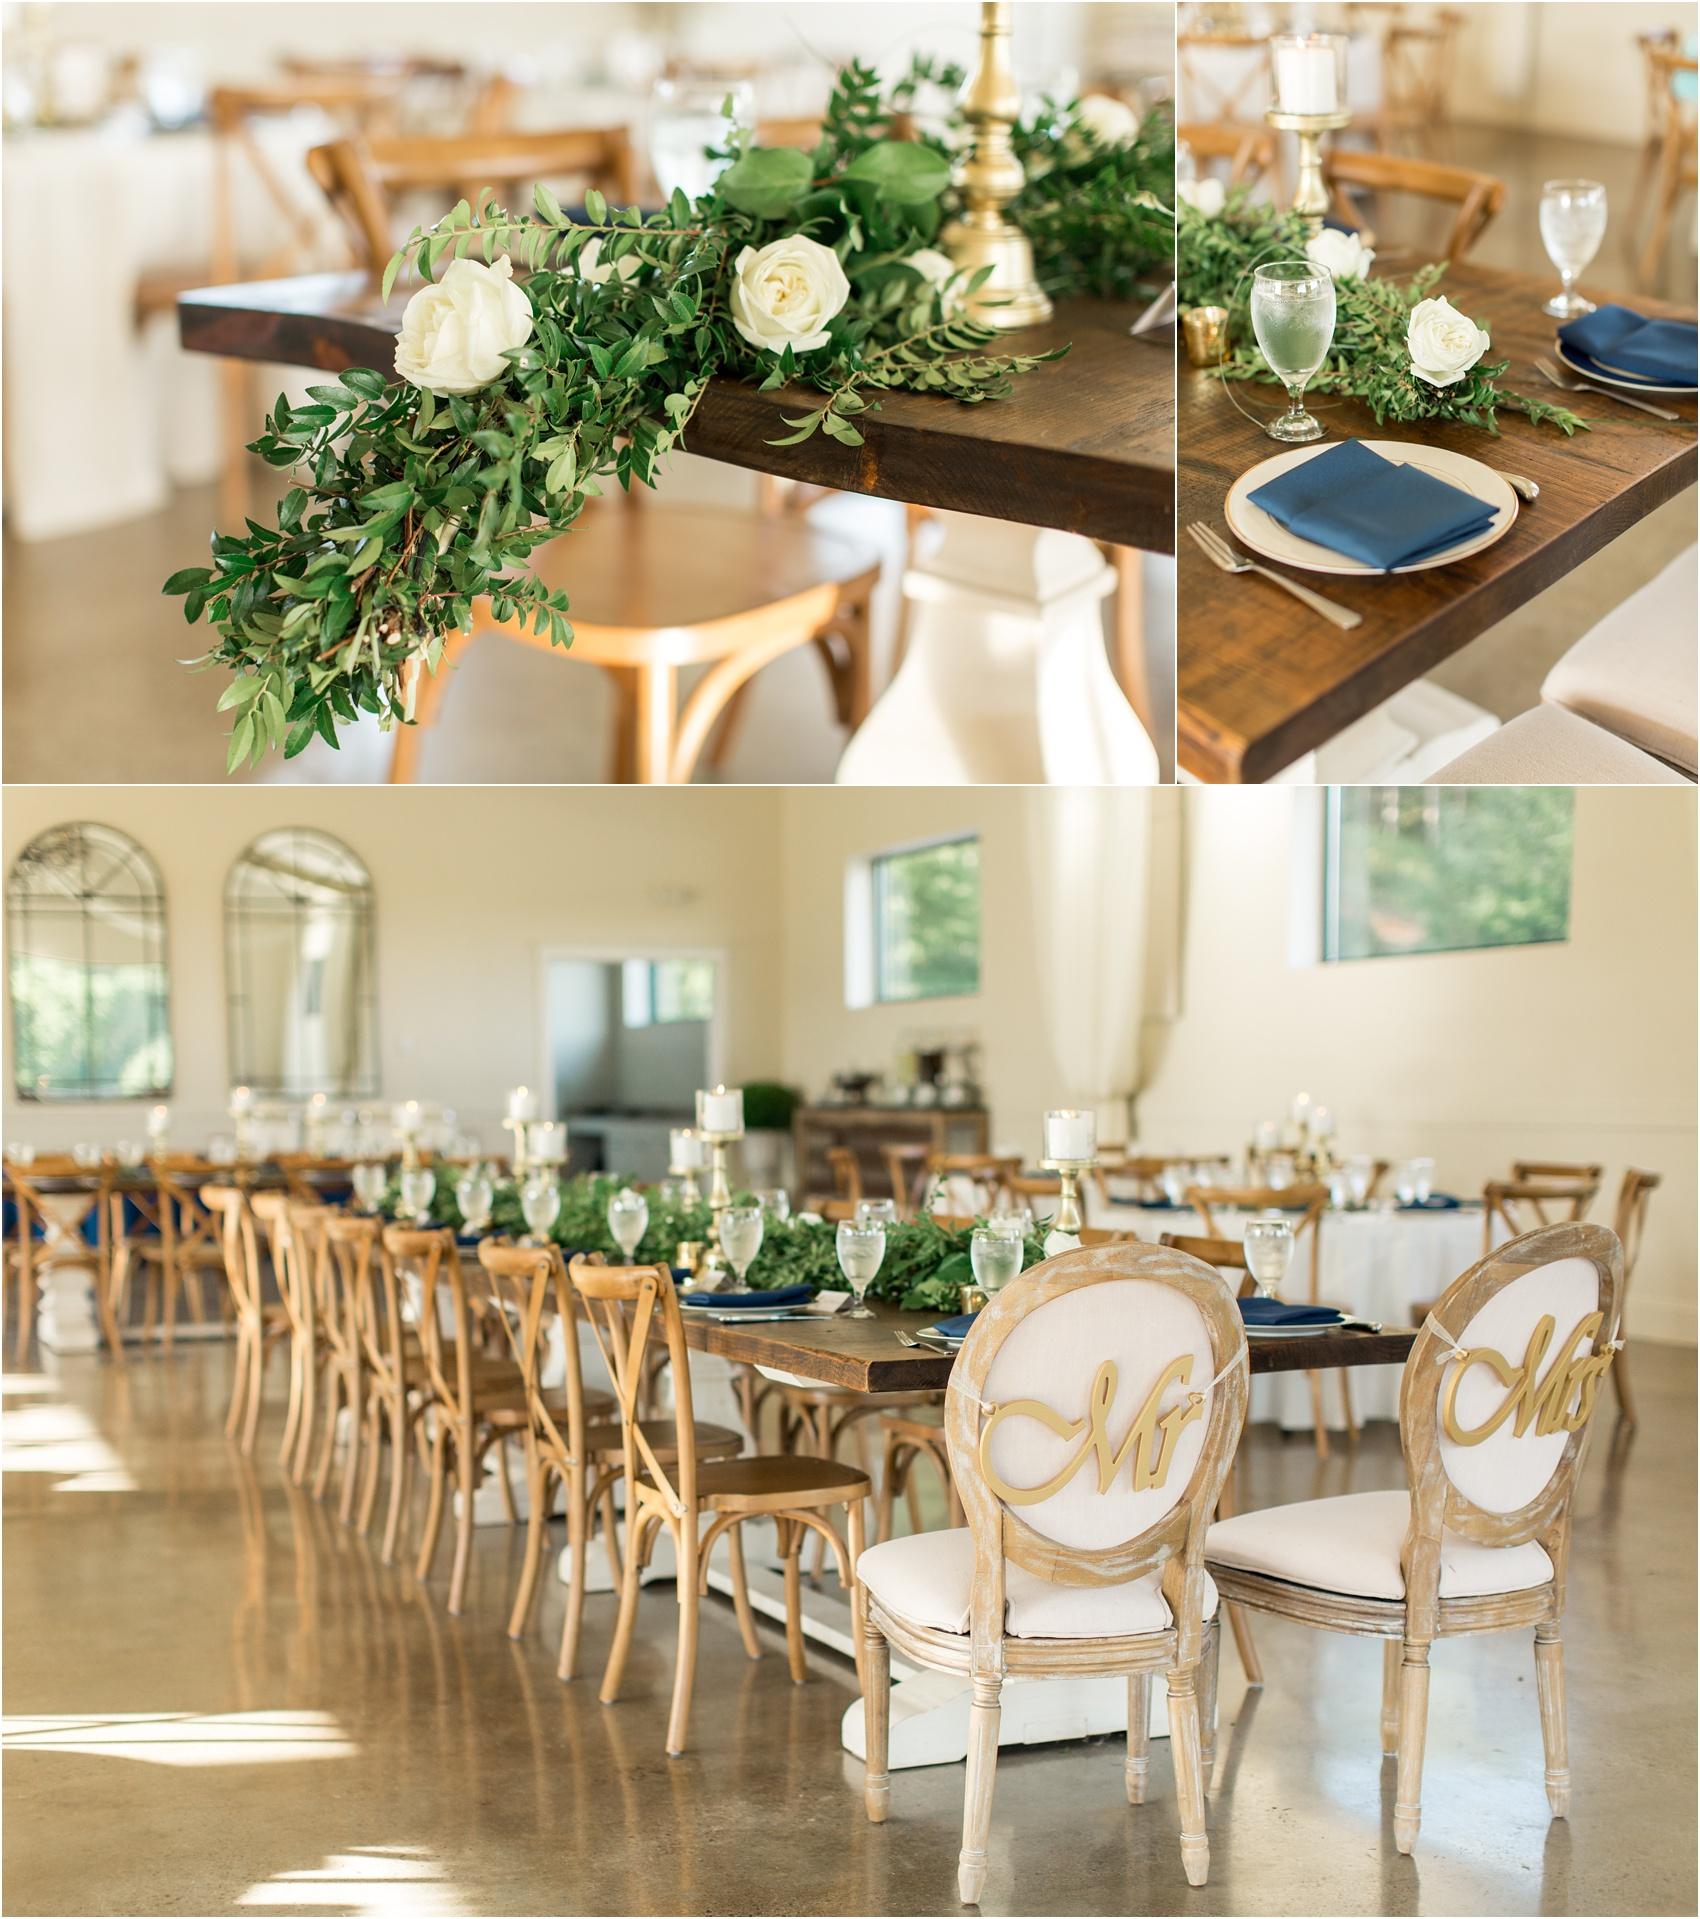 Savannah Eve Photography- Jurek-Woodworth Wedding- Sneak Peek-55.jpg